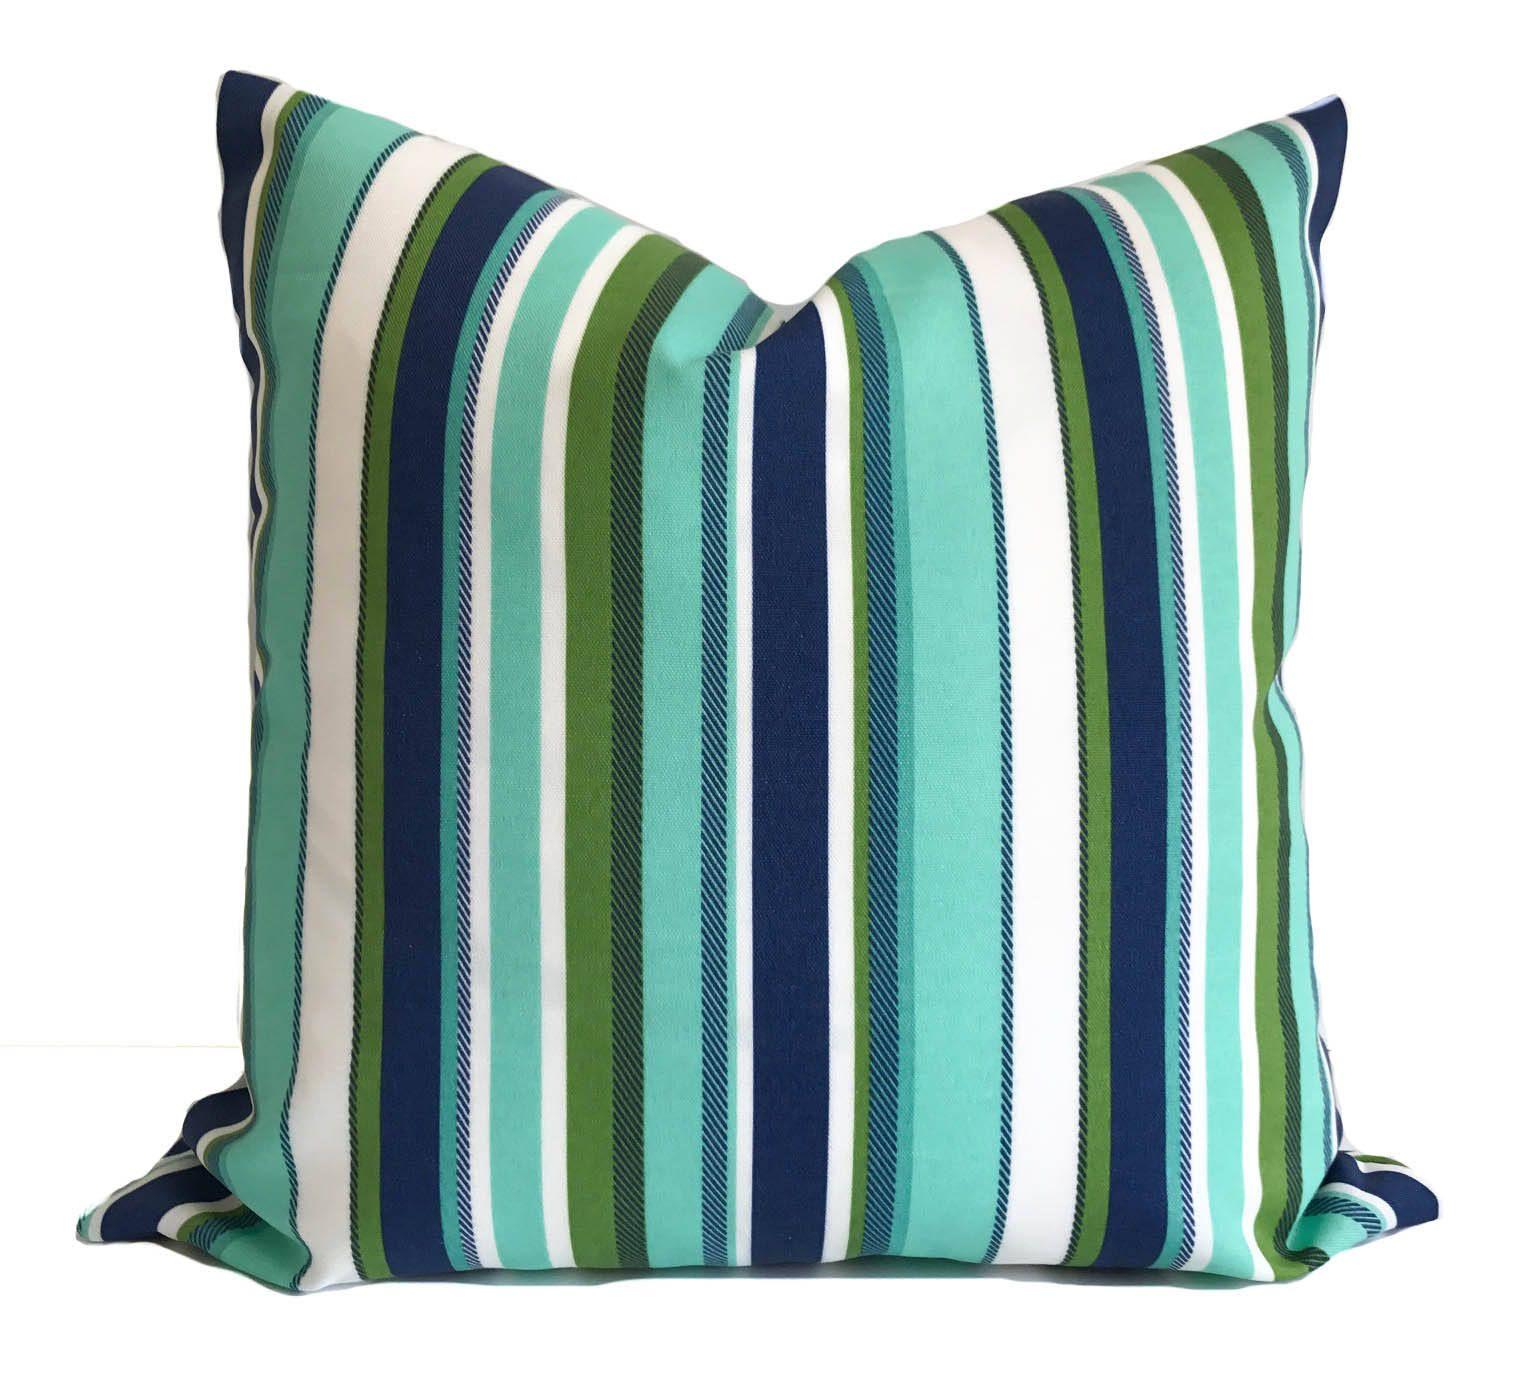 Outdoor Cushion, Patio Cushions, Outdoor Pillow Cover, Blue Outdoor Pillow,  Outdoor Throw